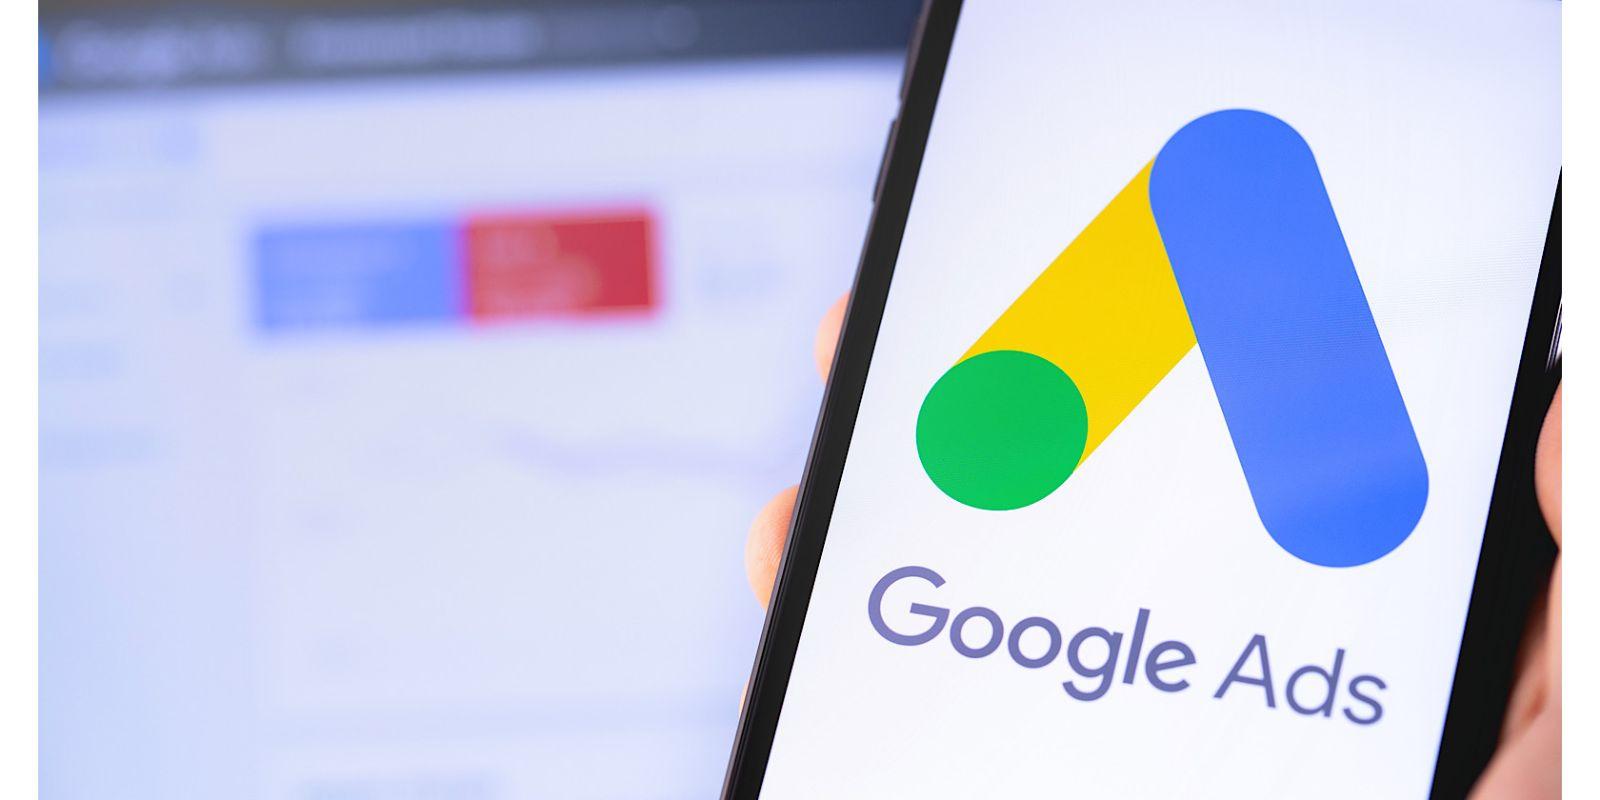 google-ads-search-engine-journal-shirudigi